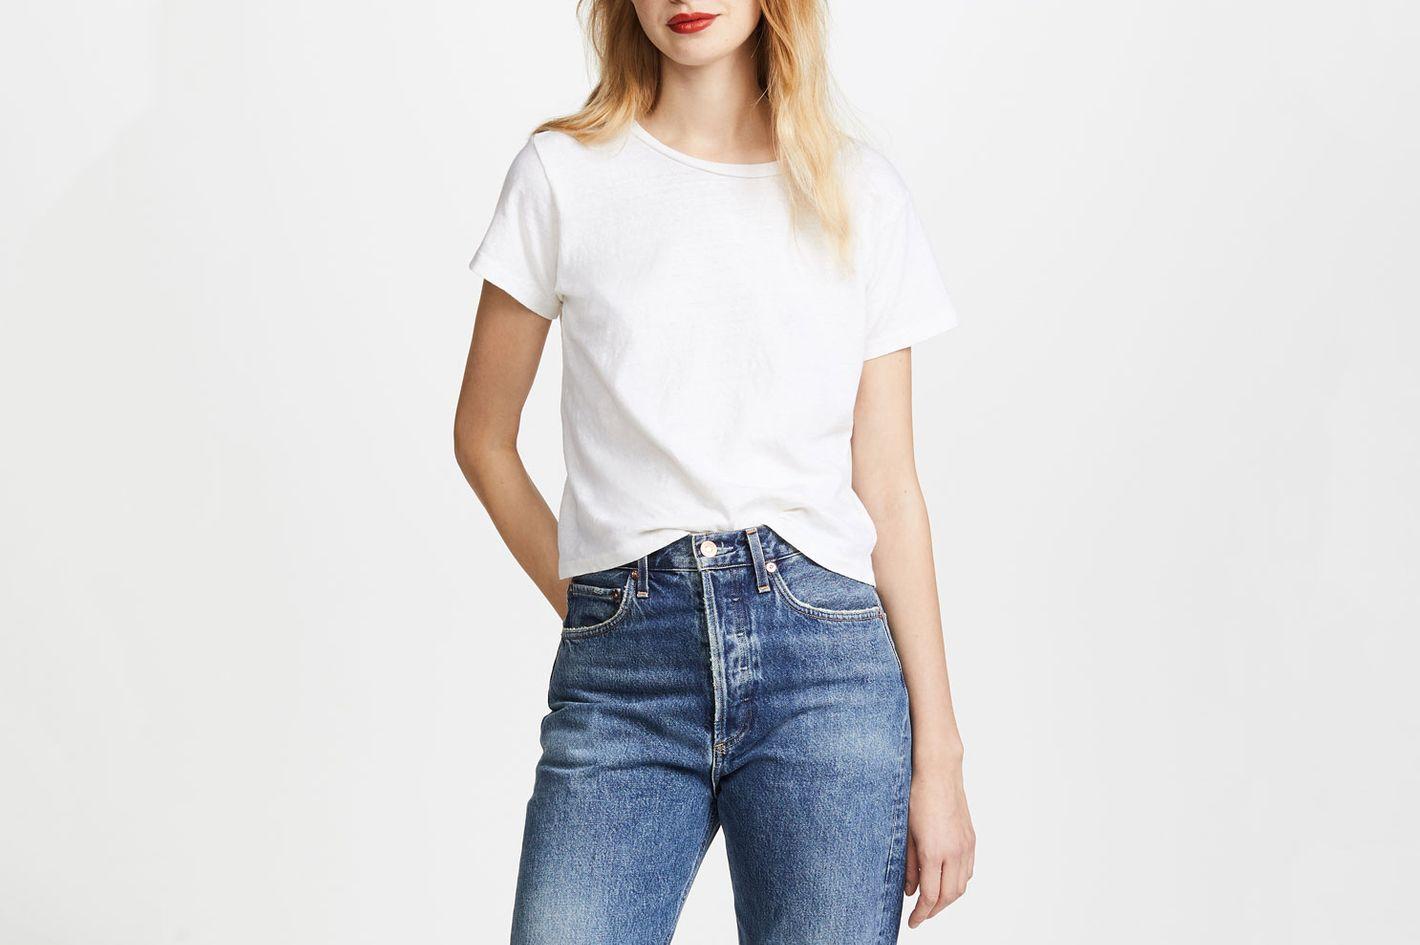 Get Naked Woman T-shirtGift For HerArtworkGirls Summer Clothing t-shirt